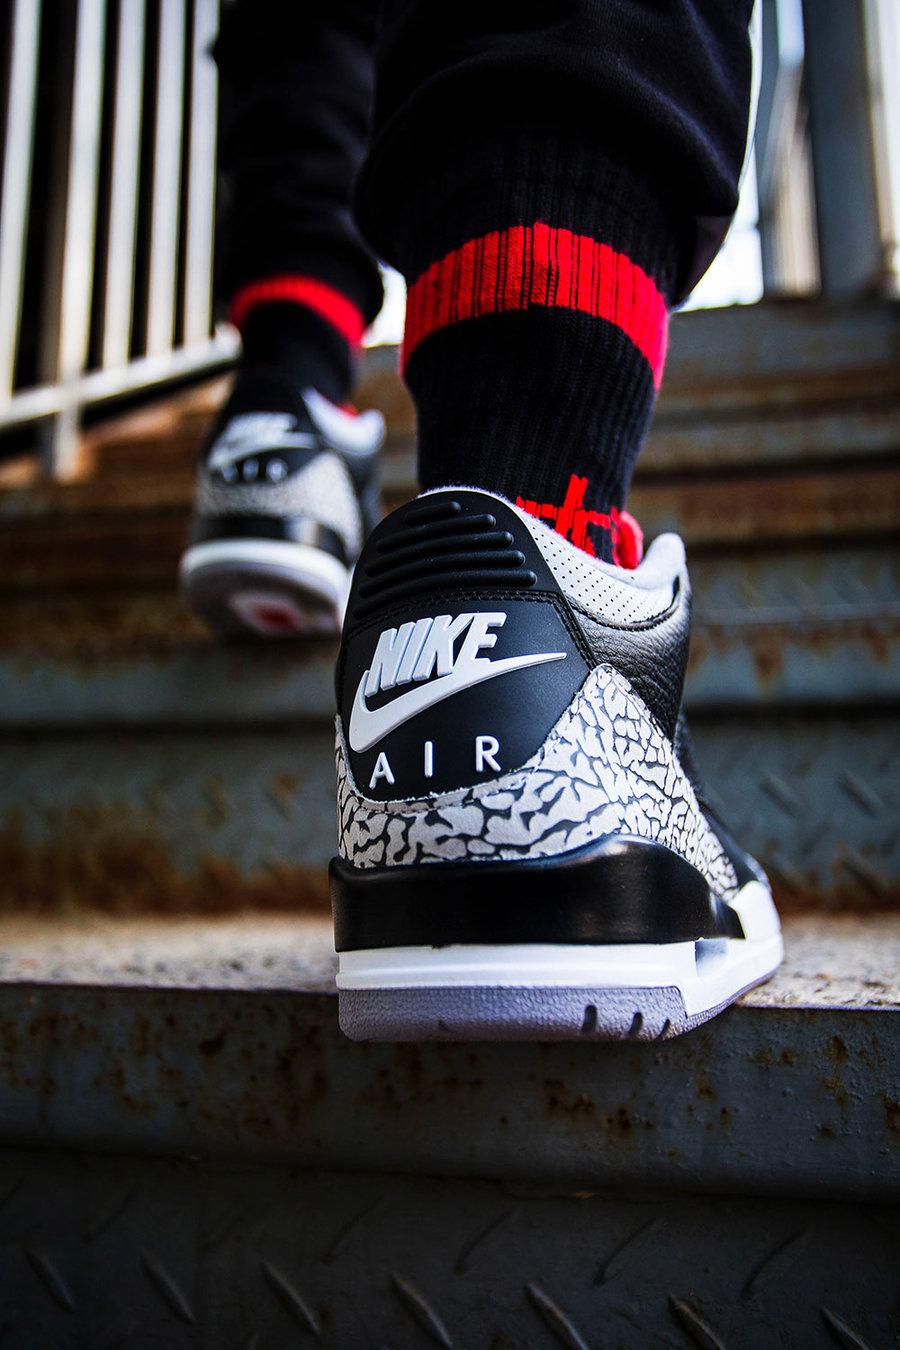 AJ3,Air Jordan 3,854262-001  新年穿新鞋的最佳之选,除了这双我想不出第二个!